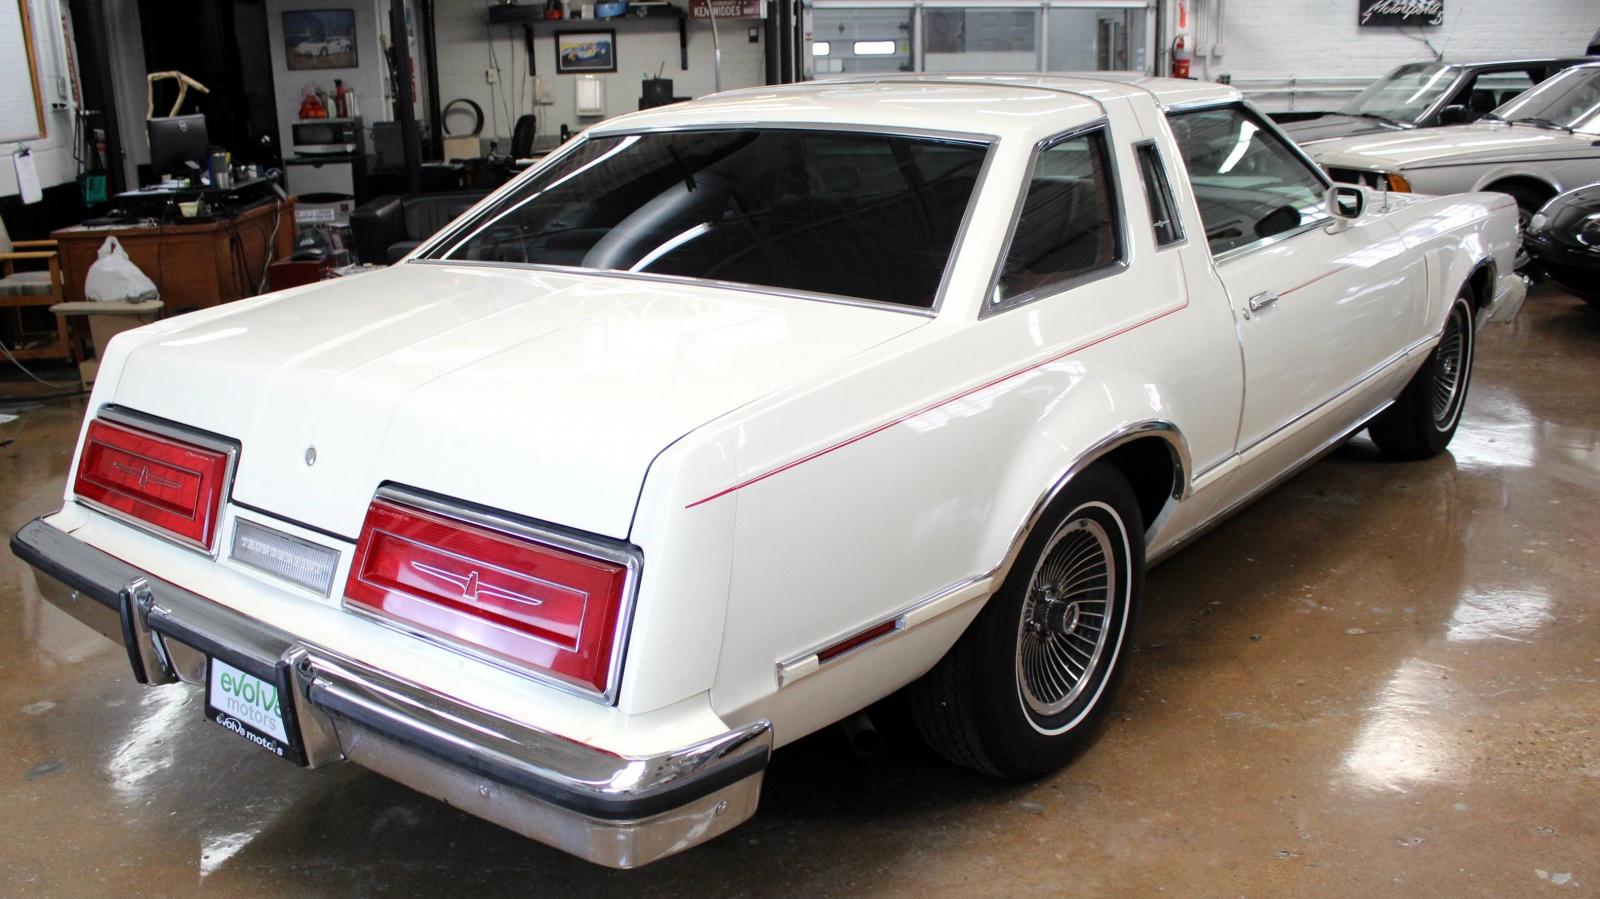 One Owner Survivor: 1979 Ford Thunderbird